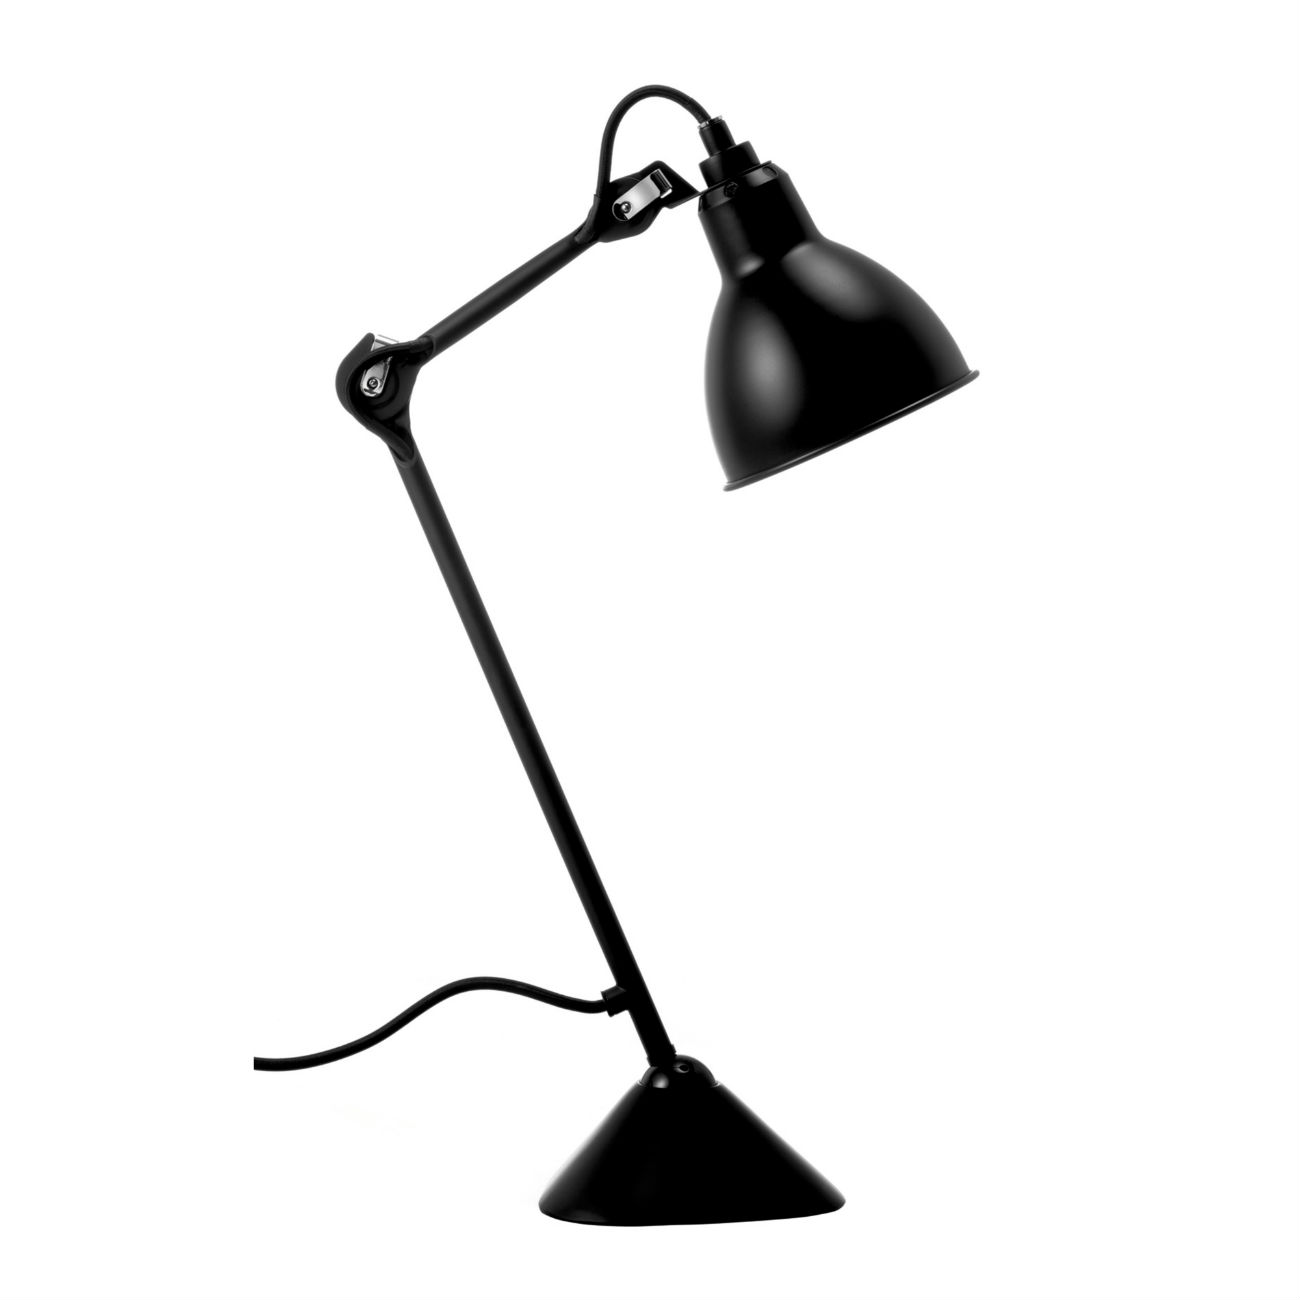 lampe gras no 205 bordlamper lystorvet. Black Bedroom Furniture Sets. Home Design Ideas